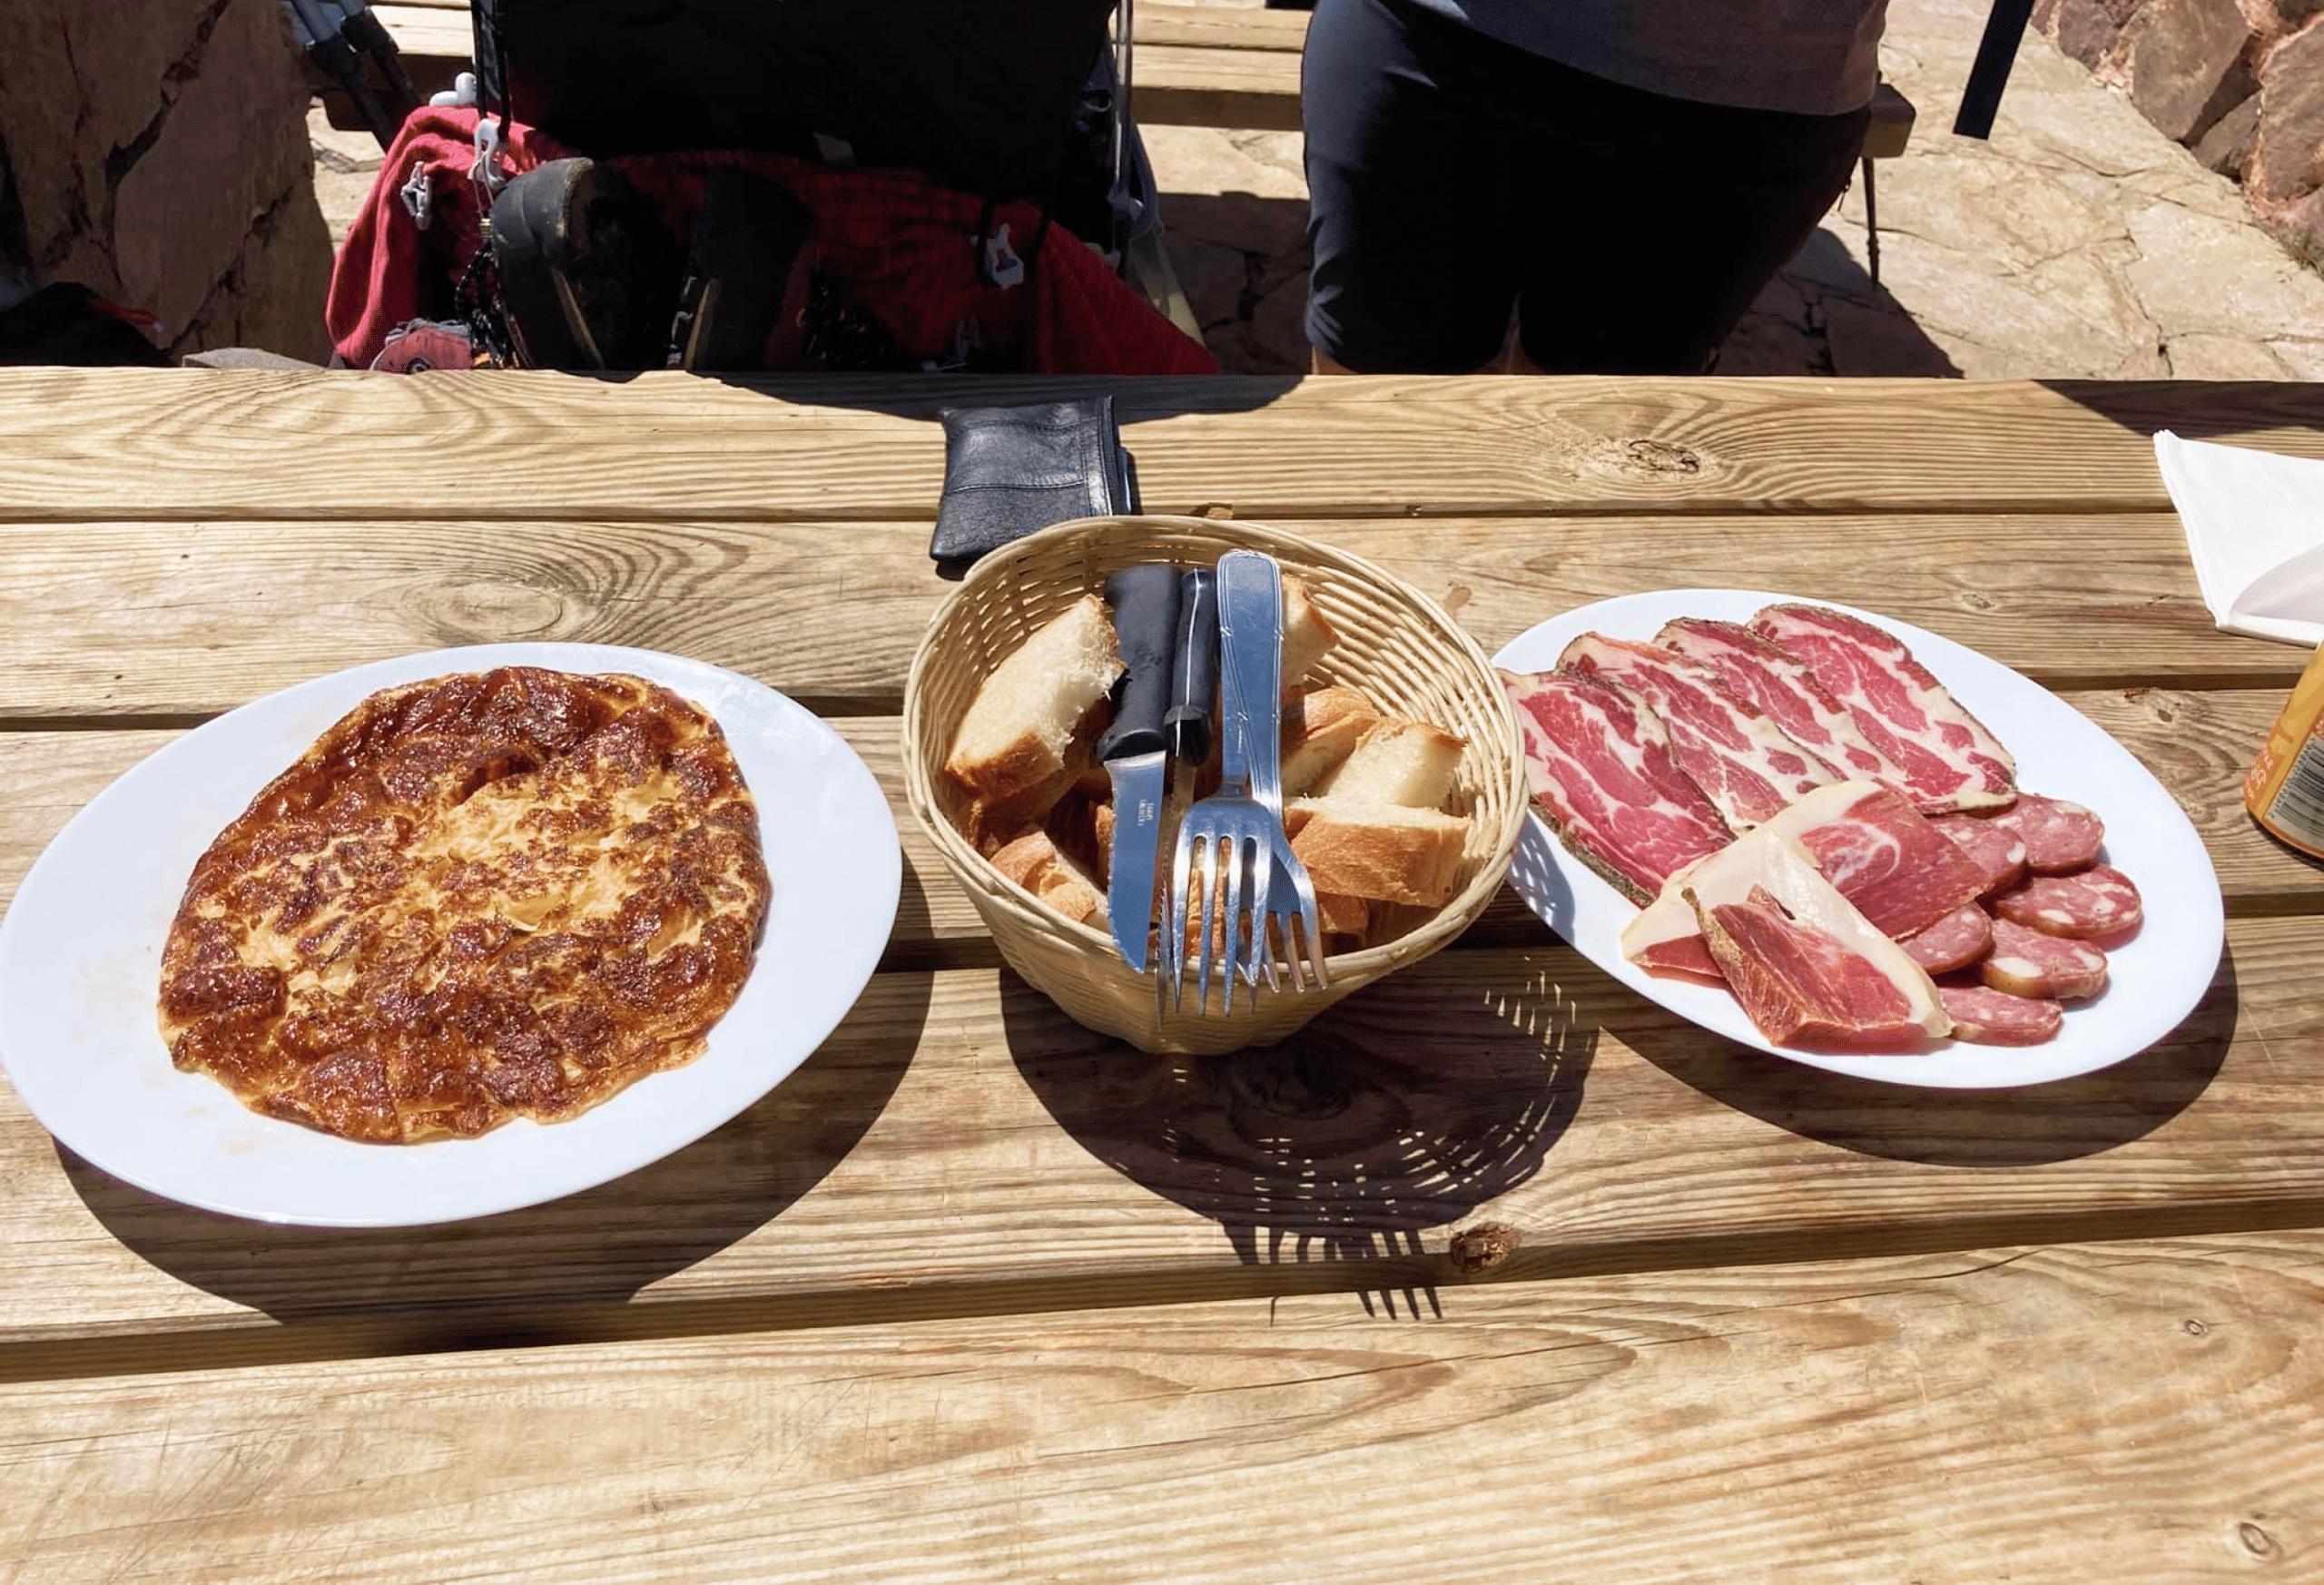 Délicieuse omelette garnie servie en bergeries